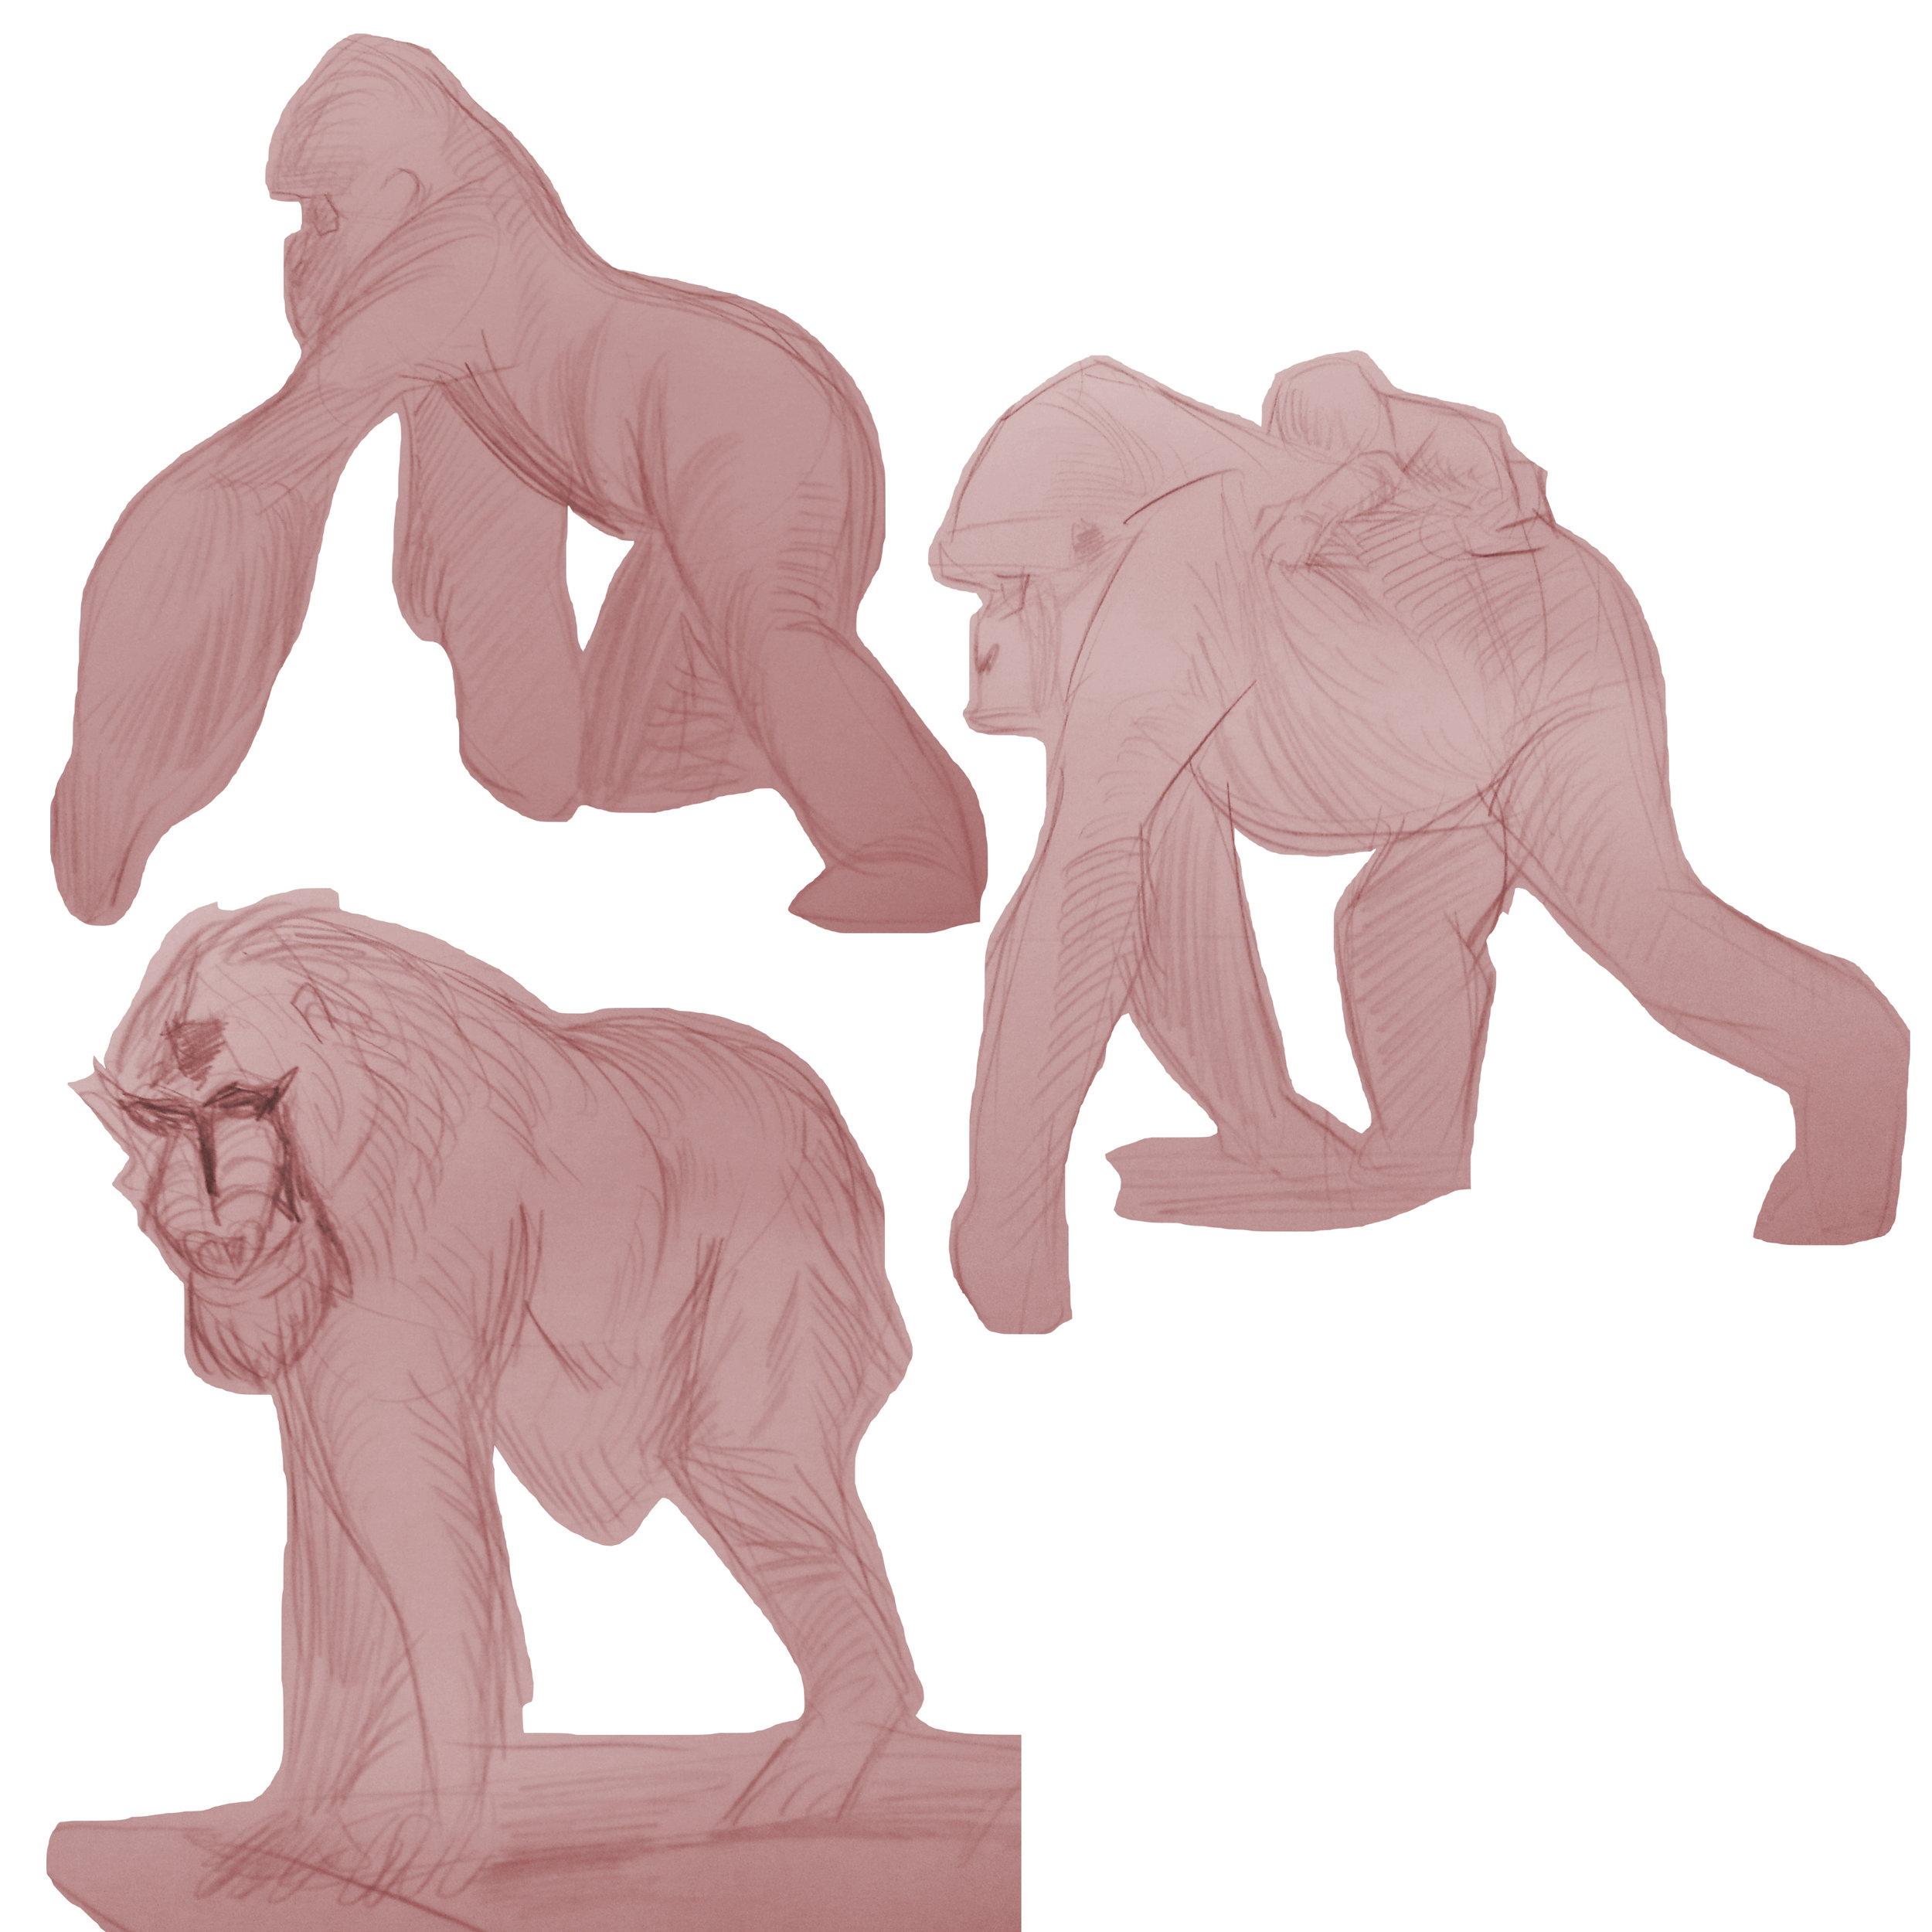 Ape drawings study